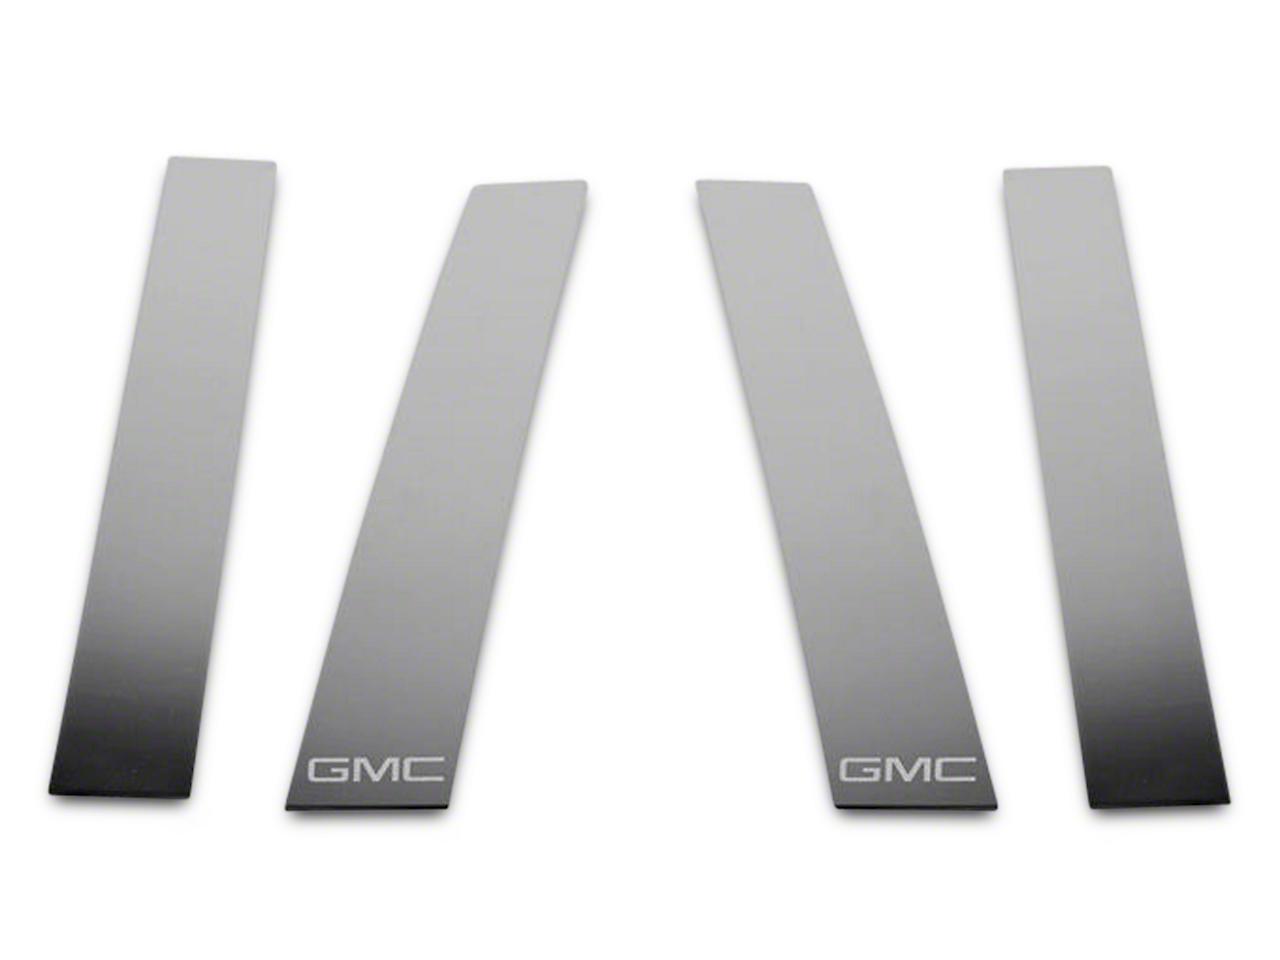 Stainless Steel Pillar Posts w/ GMC Logo (14-18 Sierra 1500 Double Cab, Crew Cab)